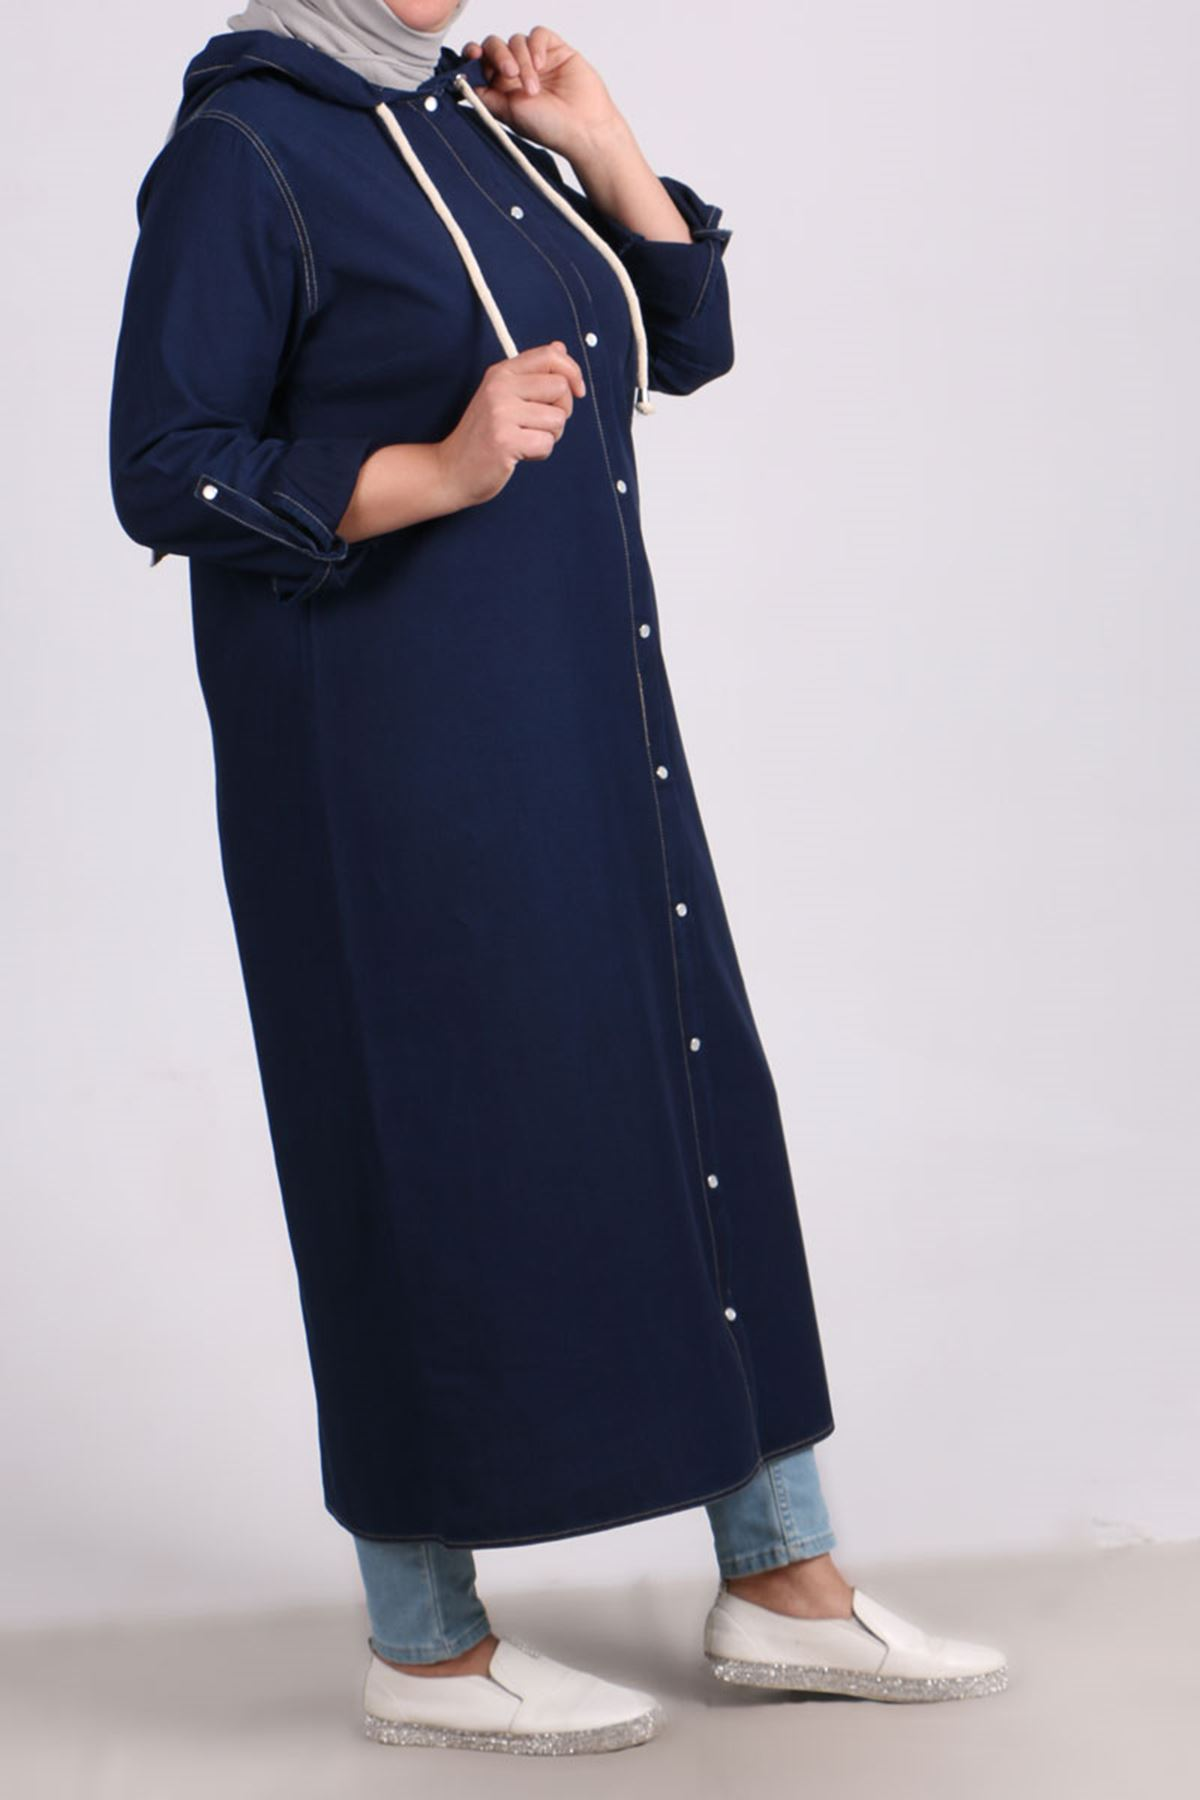 3148 Plus Size Snap Fastener Hooded Denim Jacket - Navy Blue